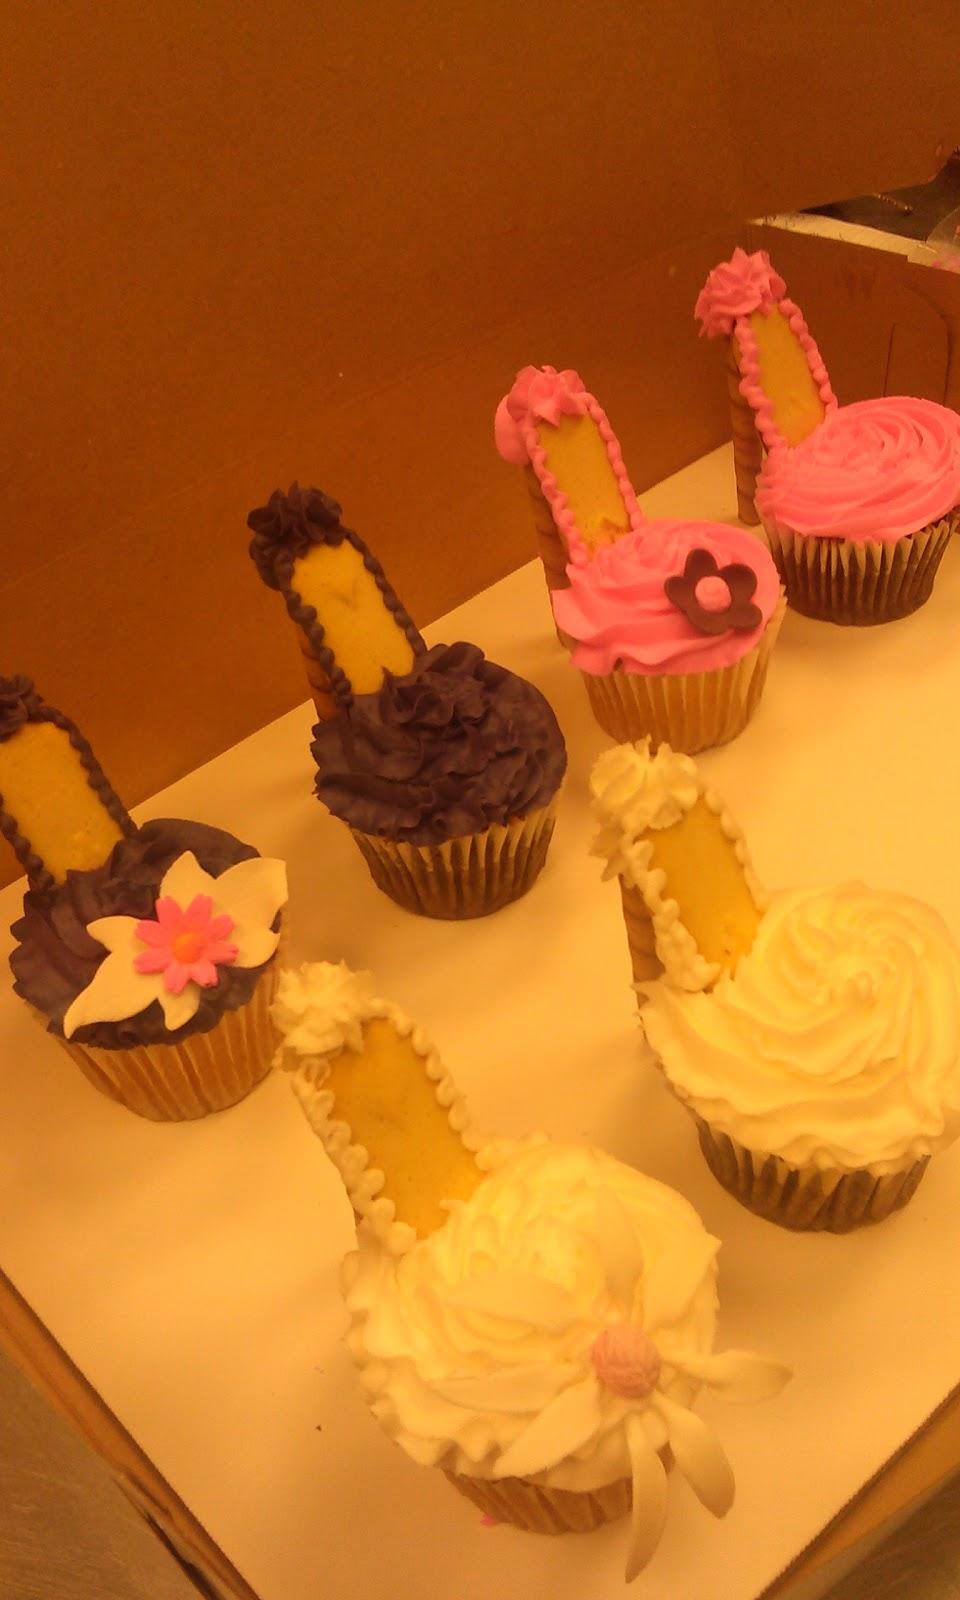 Cake Art Lawrenceville Hwy : CAFE AROMAS: Shoe Cupcakes